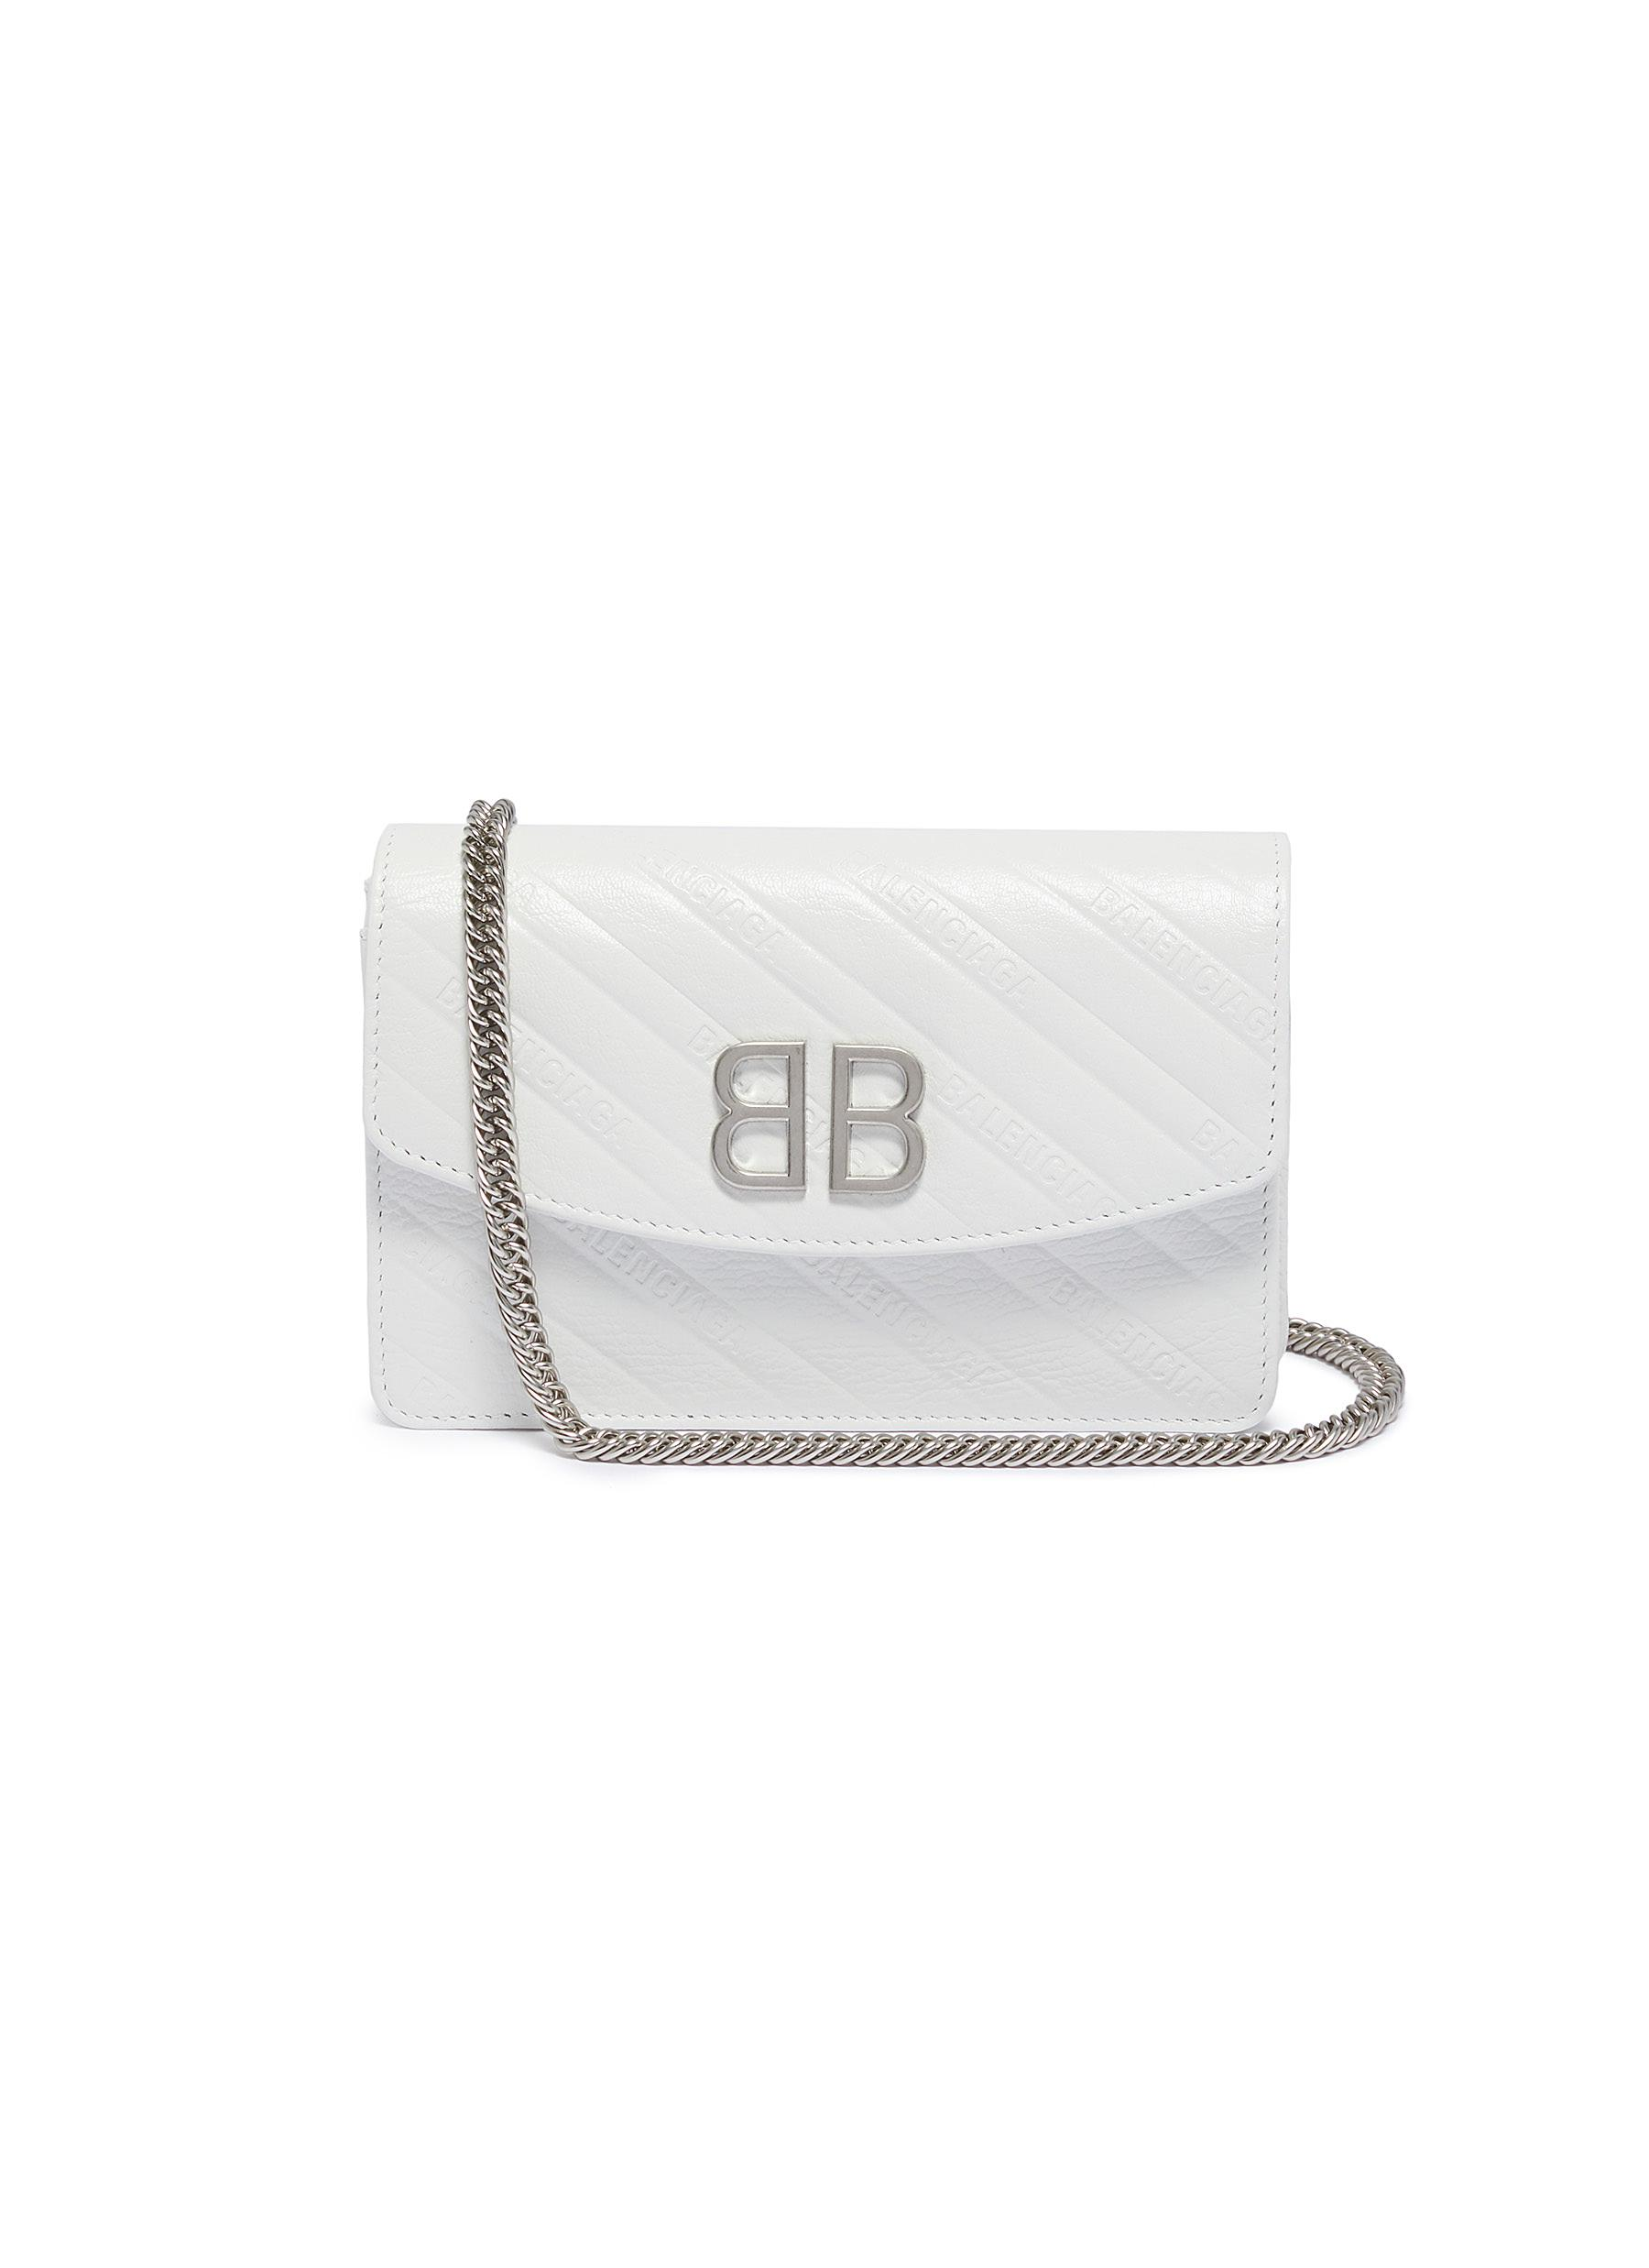 8d9963b6fda1a BALENCIAGA | 'BB' logo embossed leather chain wallet | Women | Lane ...